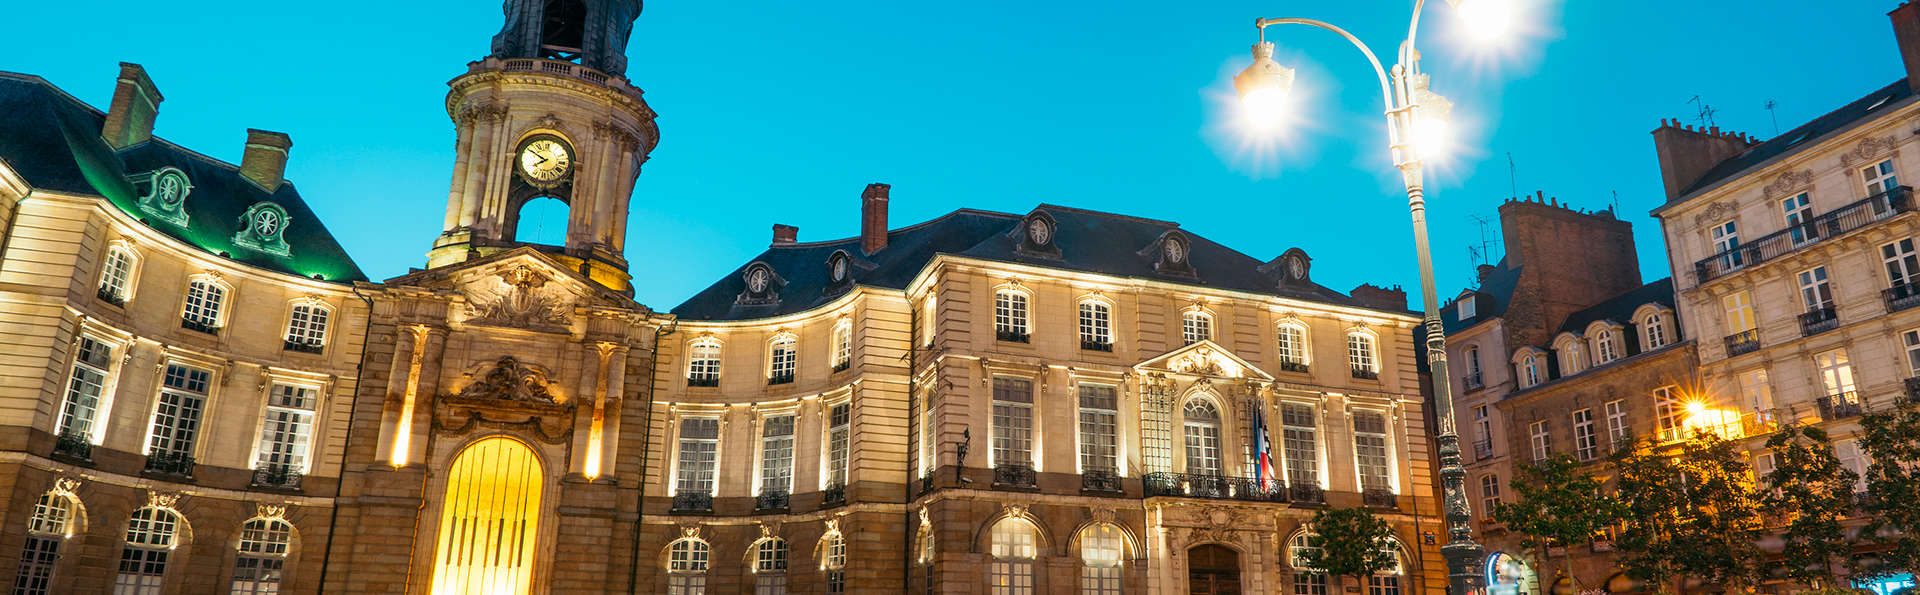 Hôtel des Lices - EDIT_destination.jpg